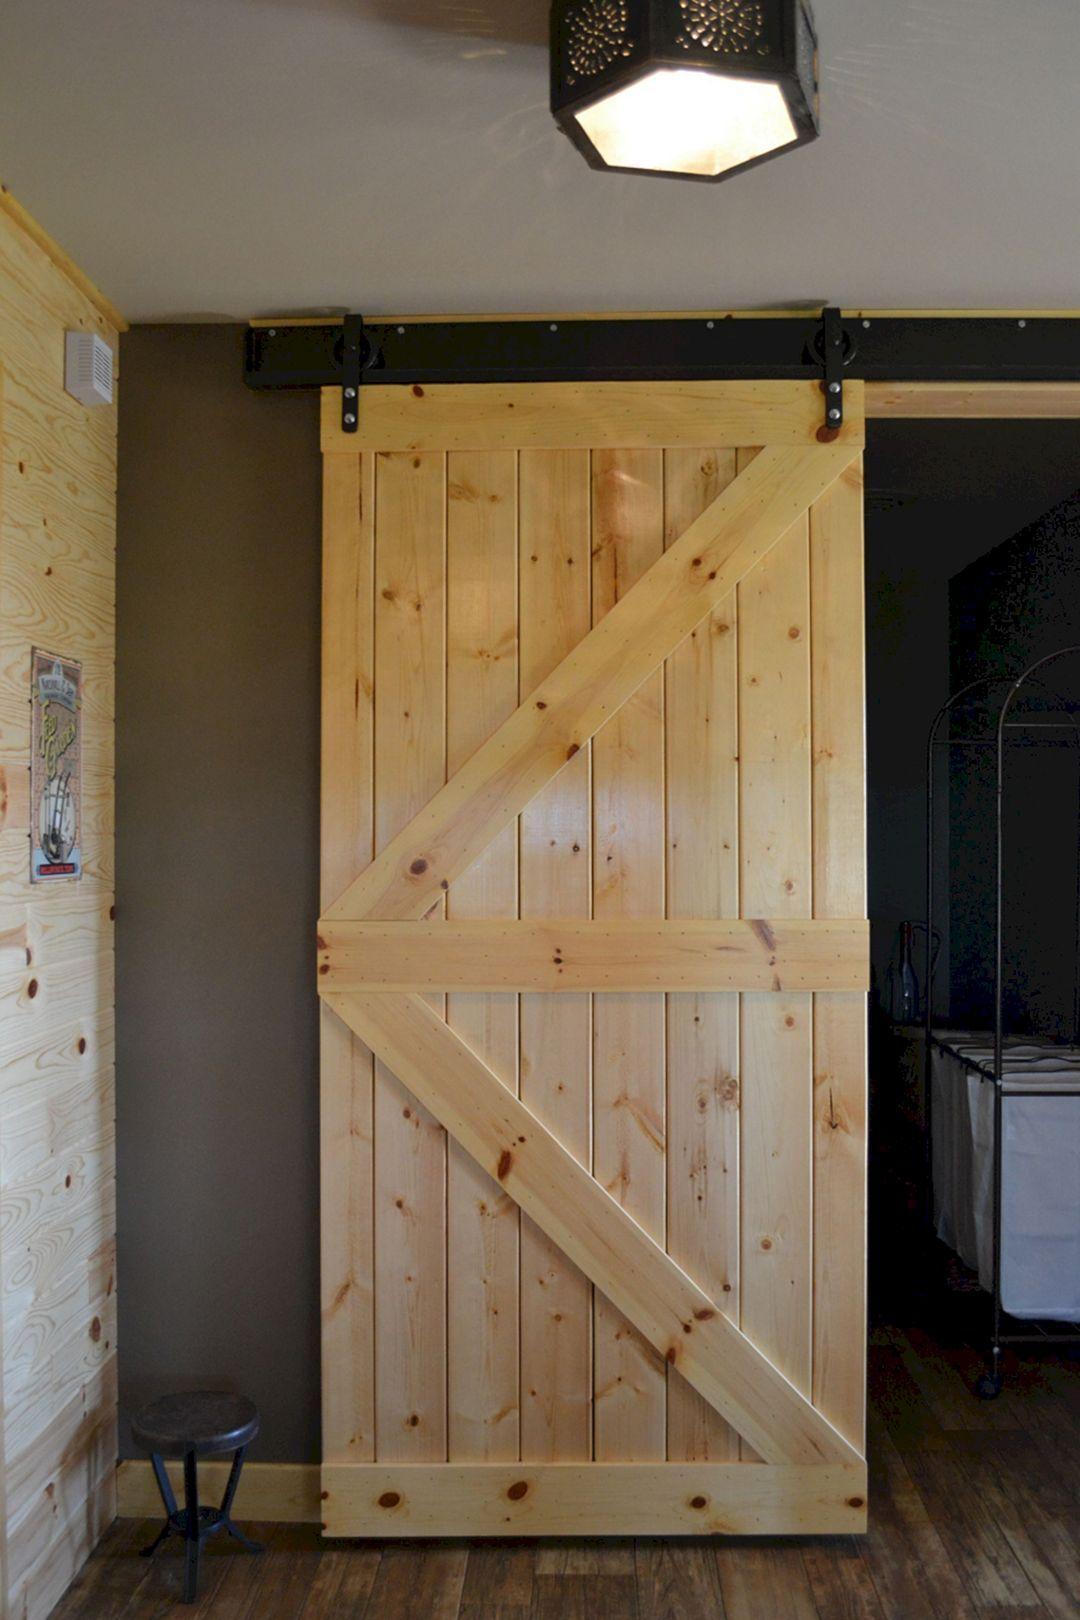 pine closet doors on 17 creative and rustic diy barn door ideas you should have it diy barn door diy barn door hardware knotty pine doors diy barn door hardware knotty pine doors